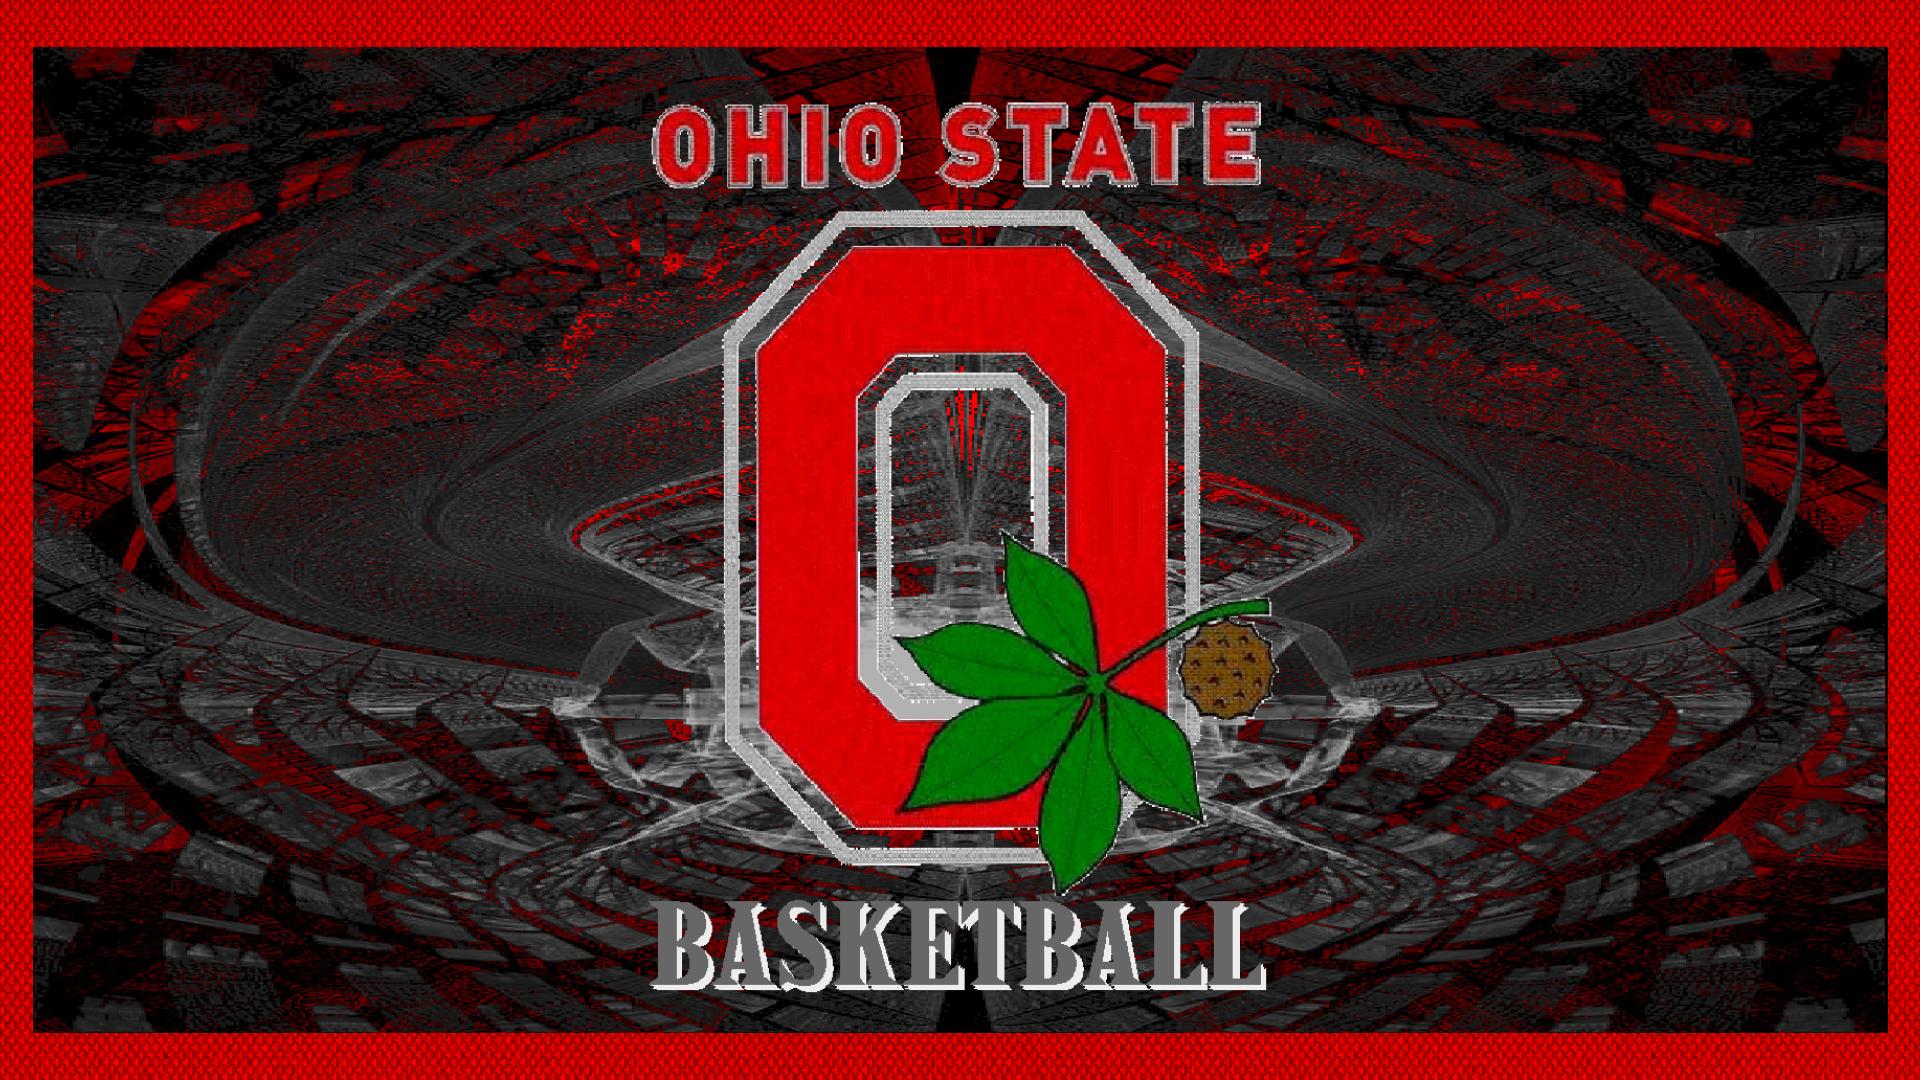 OHIO STATE BASKETBALL RED BLOCK O